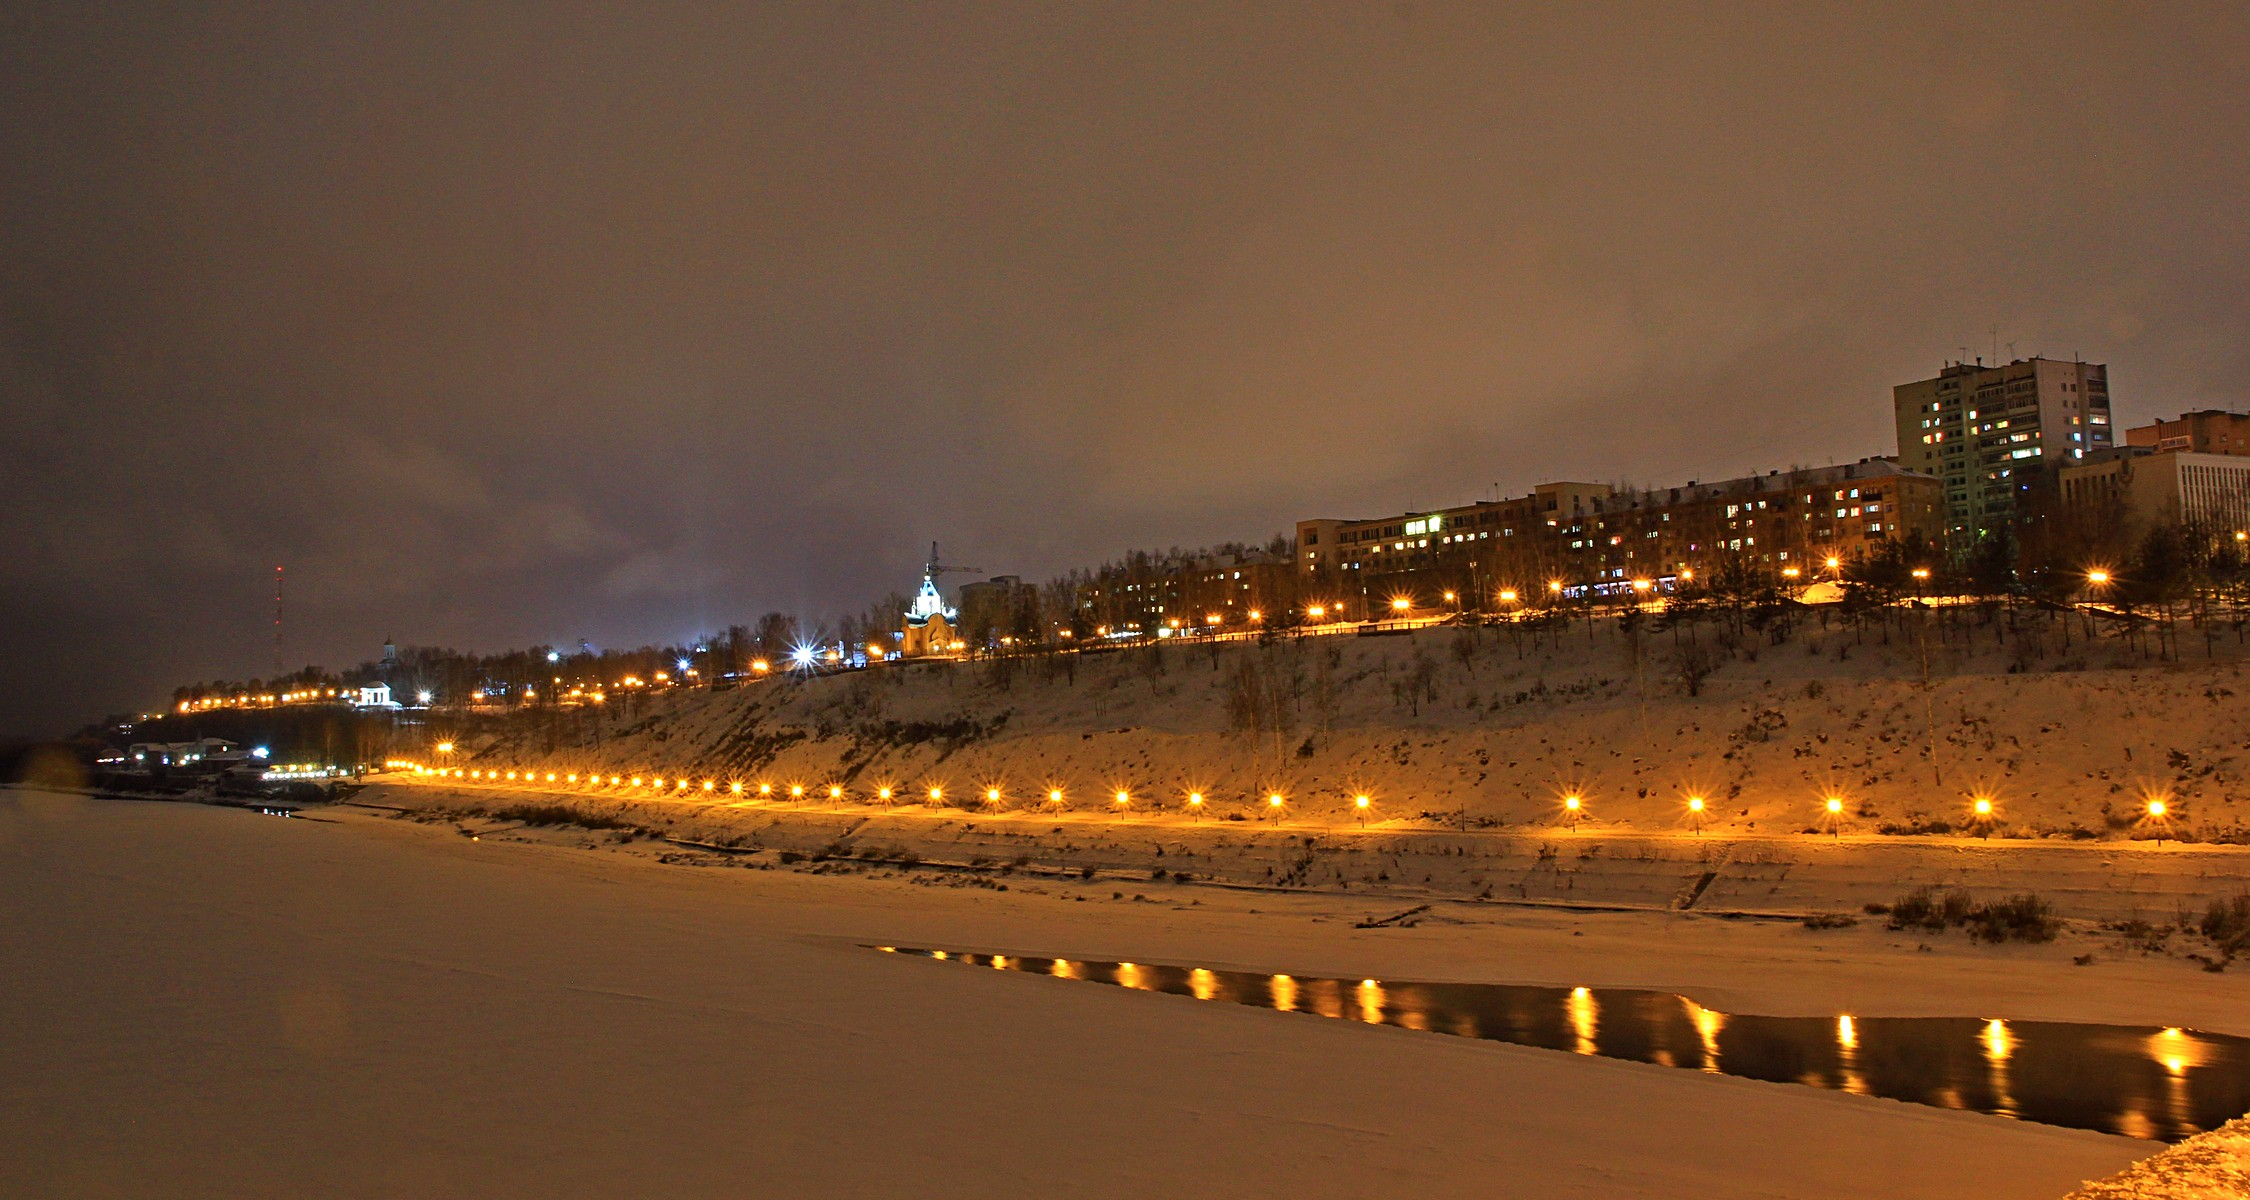 Панорама ночного Кирова с другого берега Вятки